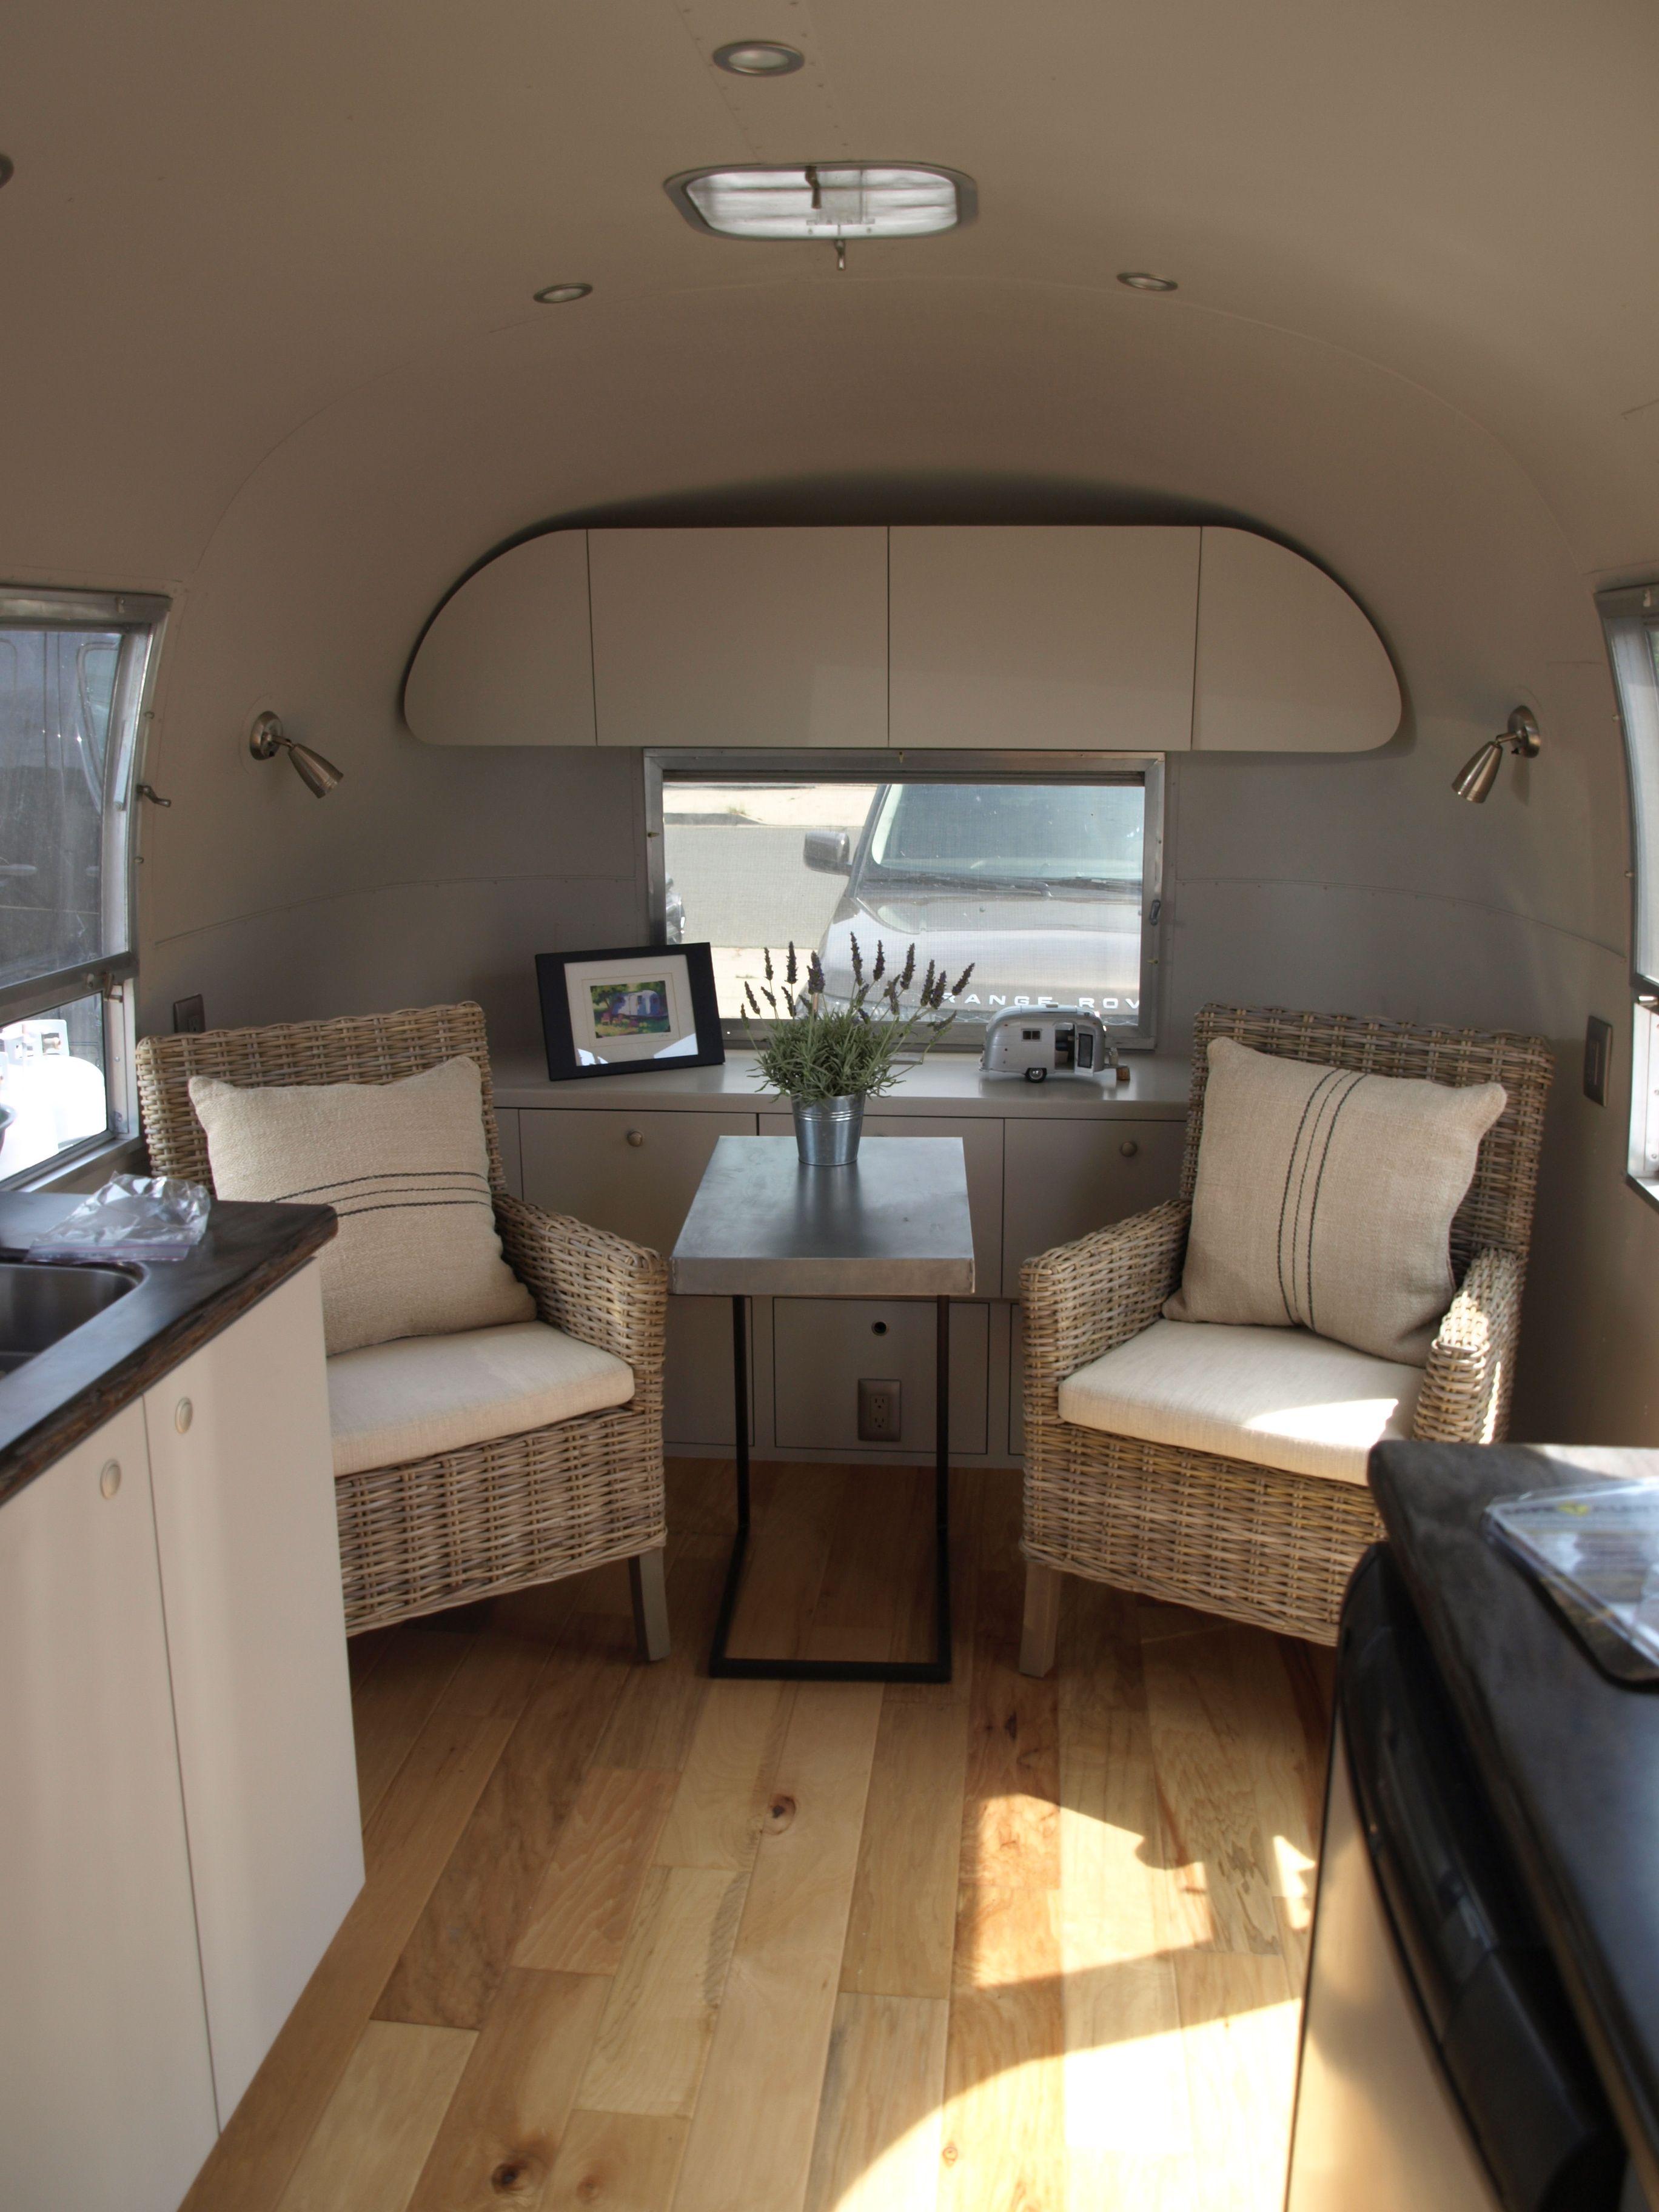 Rita Remodeled Interior Interieur Pour Camping Aux Vendanges Interieur Airstream Interieur Camping Car